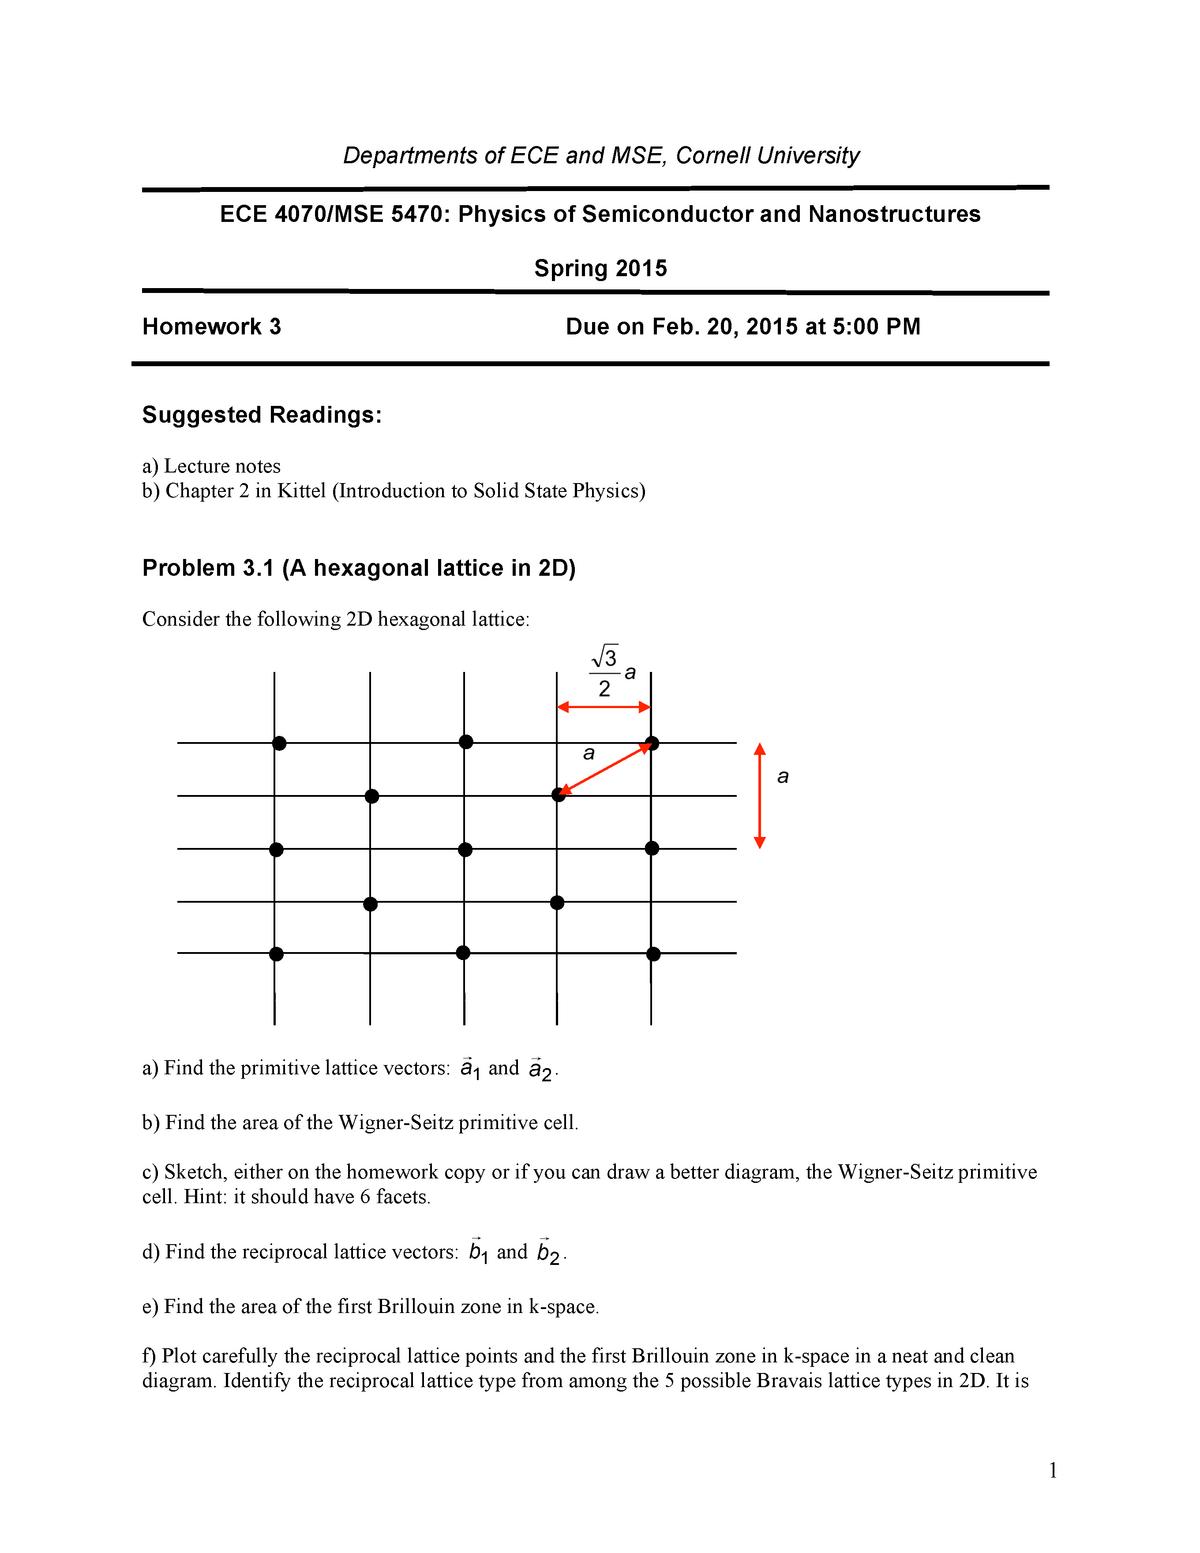 Seminar assignments - Homework 3 - ECE 4070: Physics Of